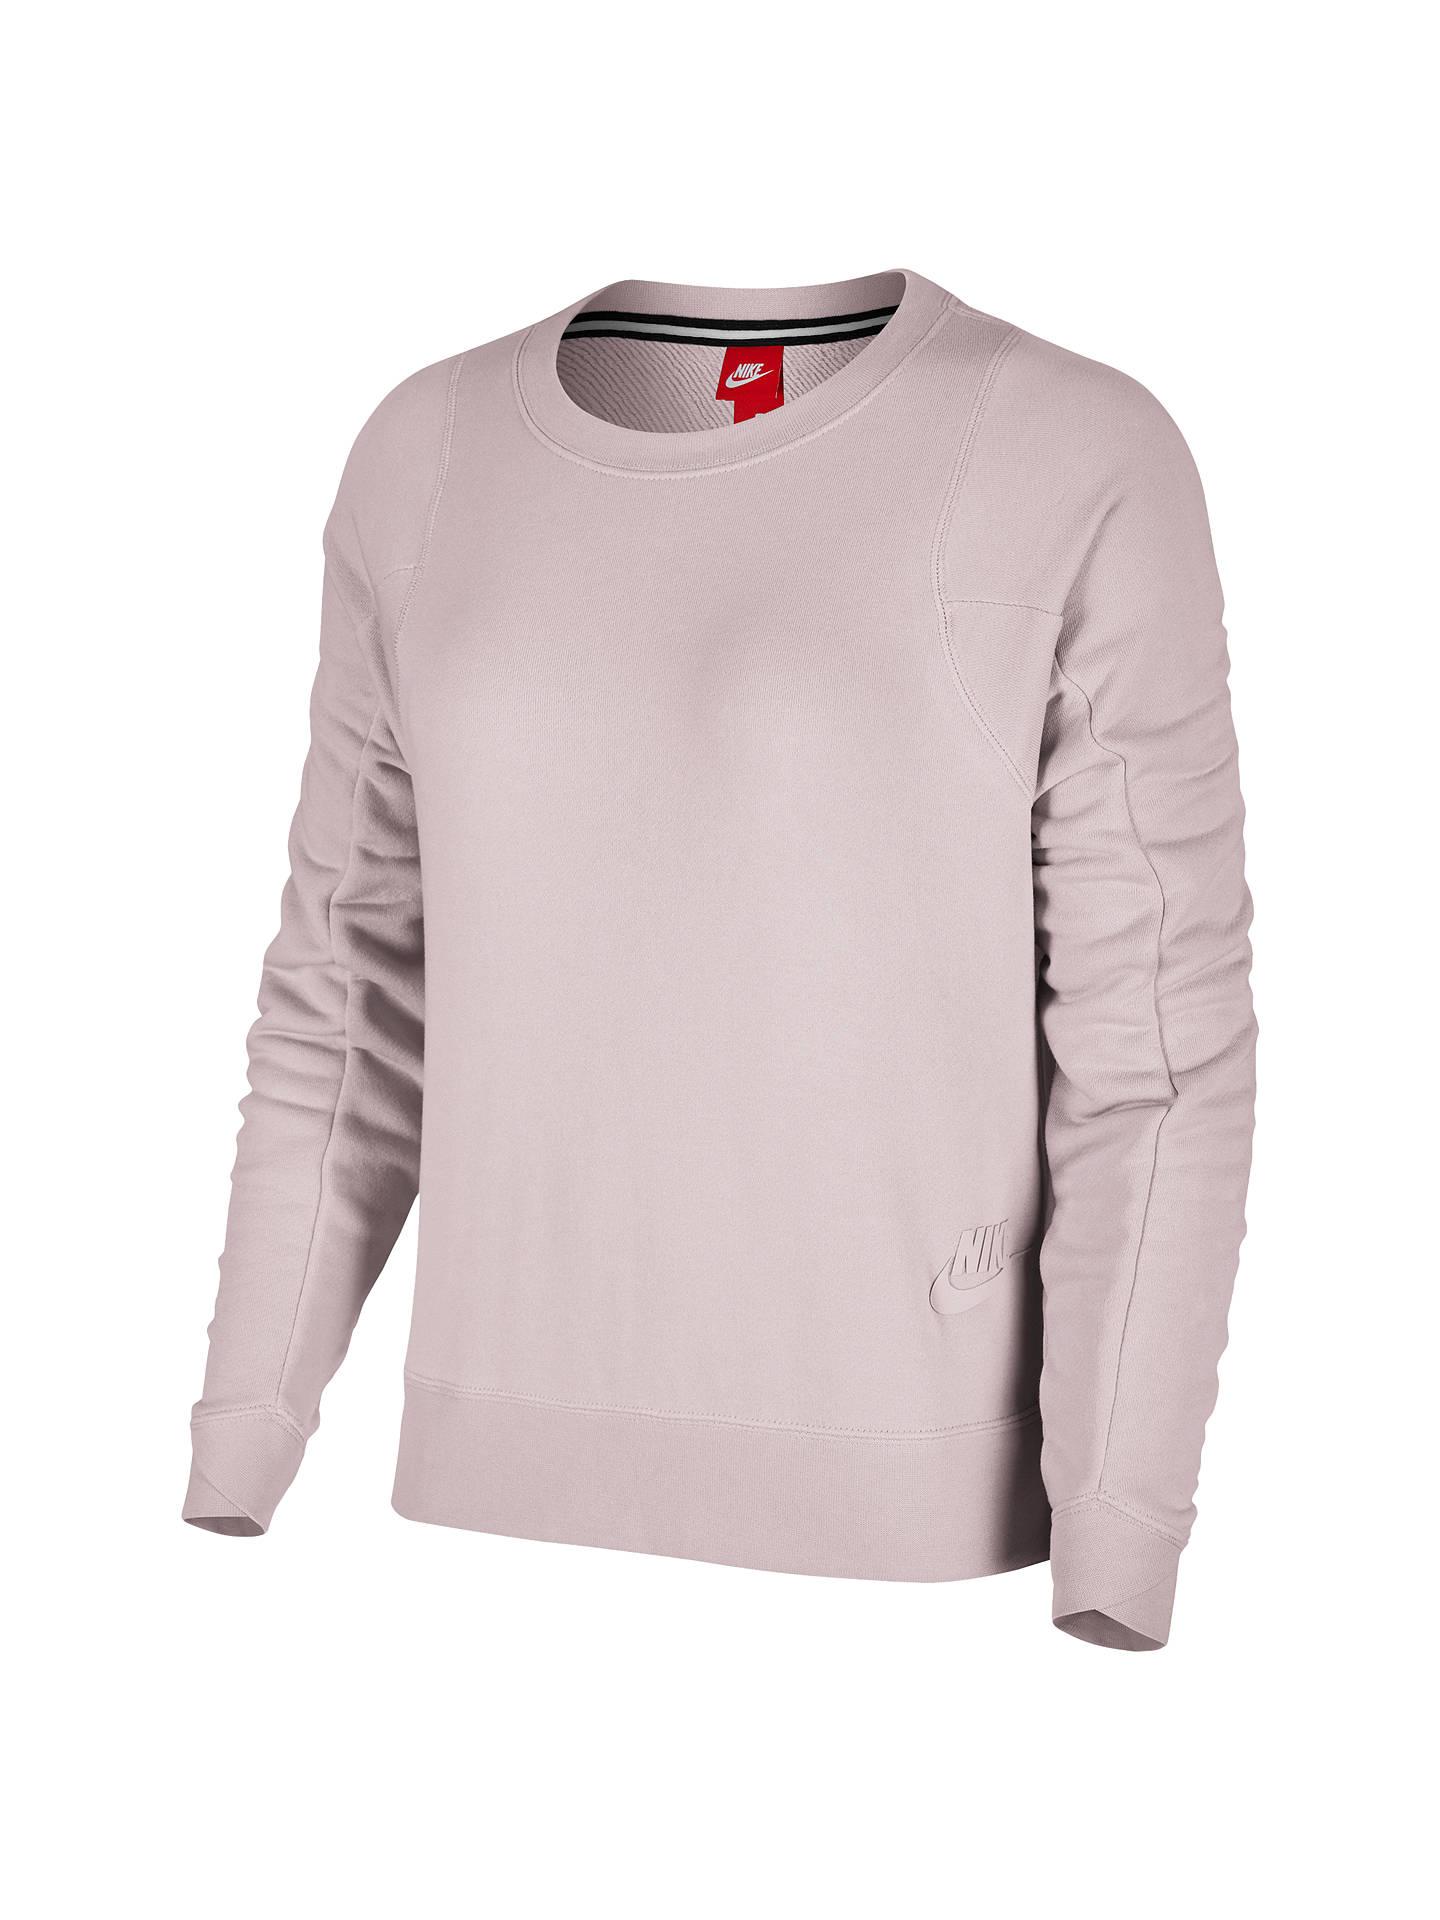 18664adf9bcc0 BuyNike Sportswear Modern Crew Sweatshirt, Rose, XS Online at johnlewis.com  ...